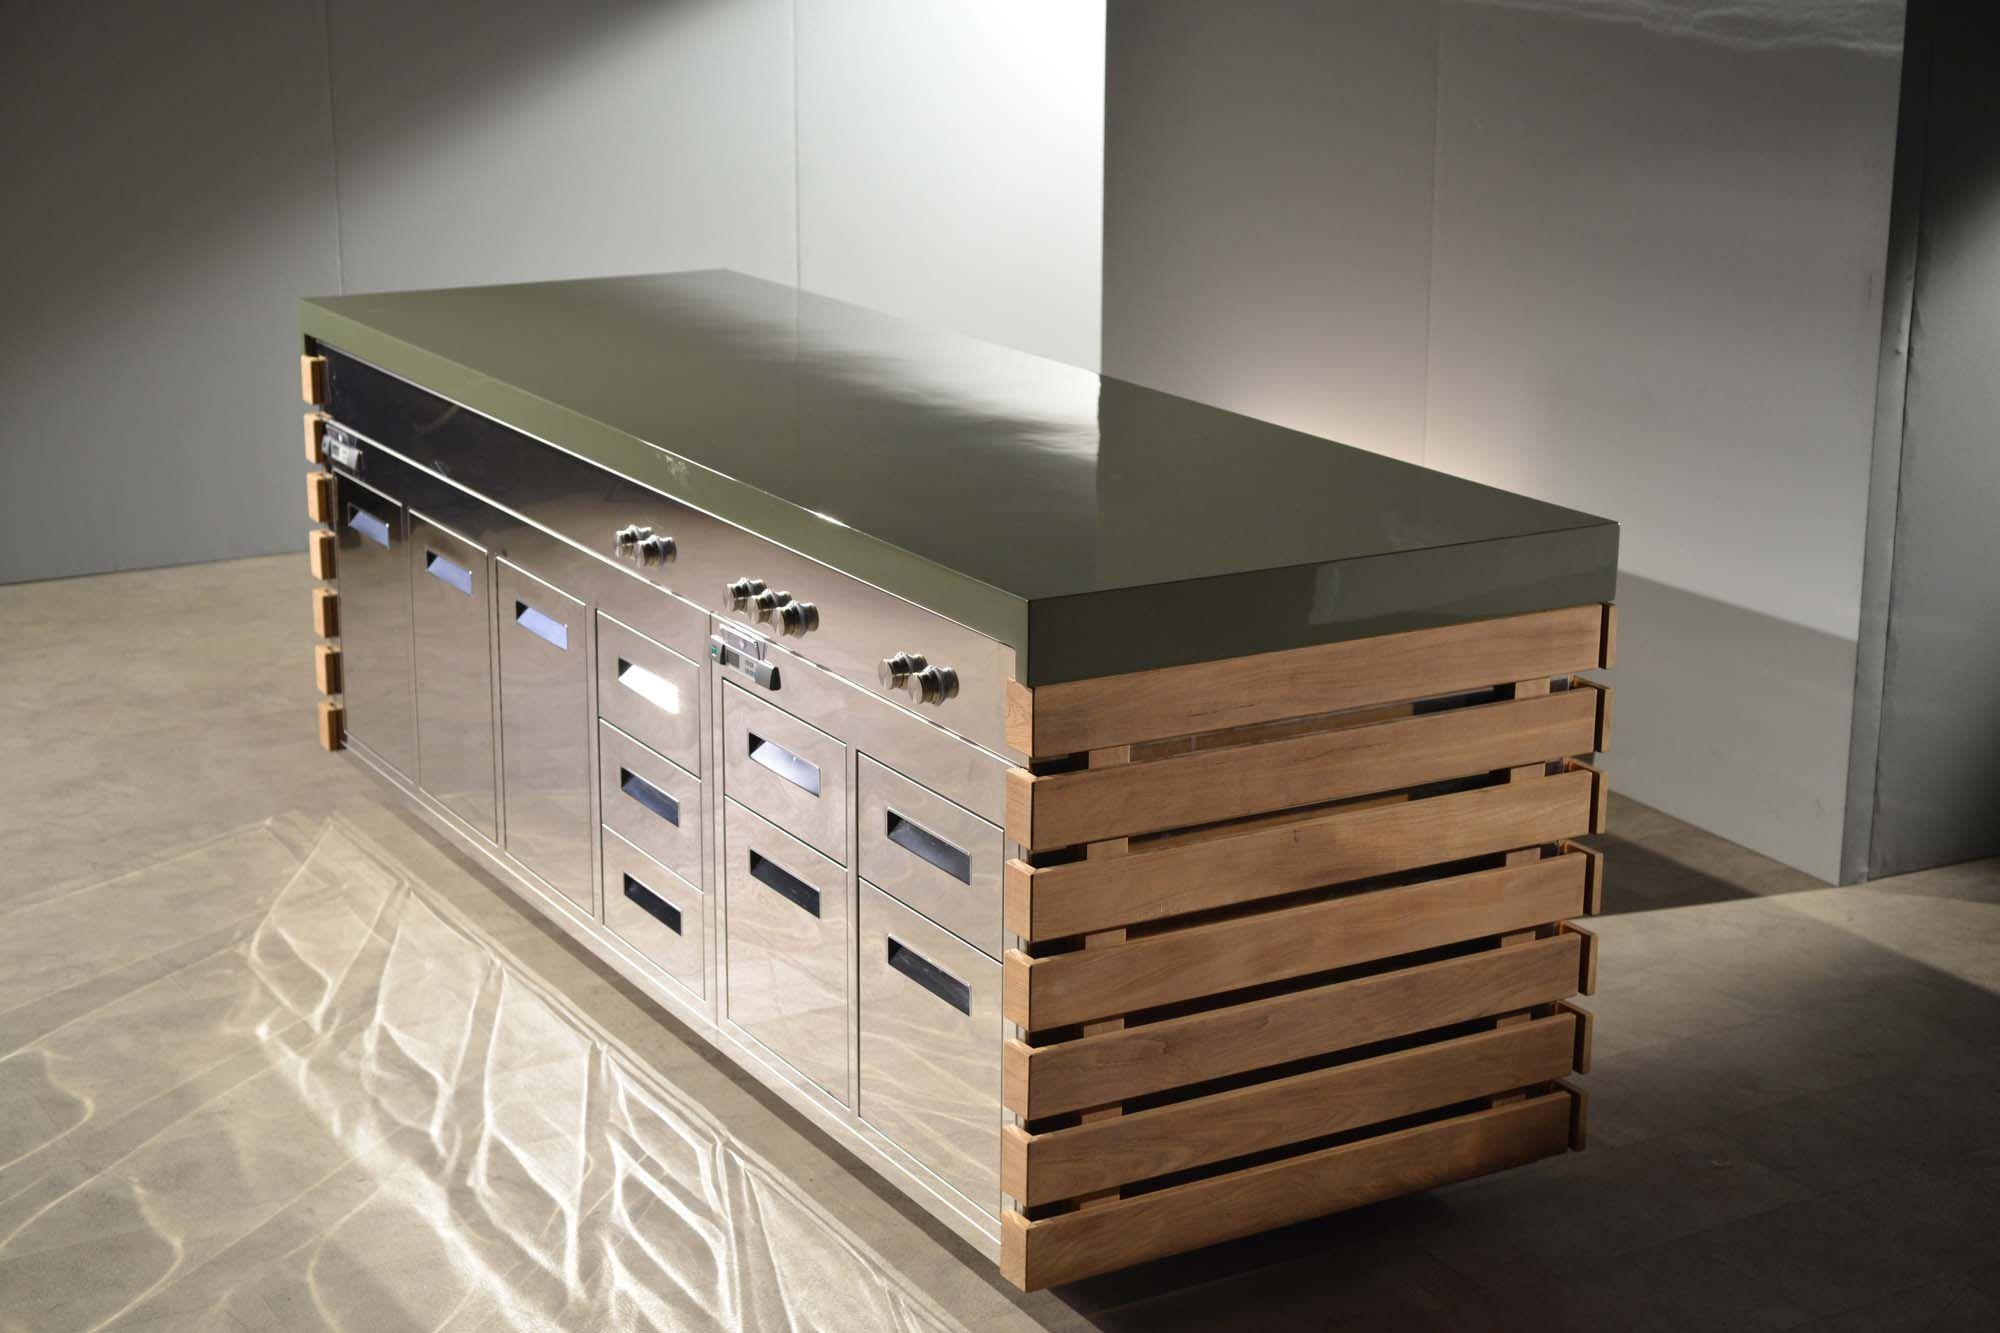 rolling island kitchen updated kitchens 现代风格厨房 不锈钢 玻璃纤维 岛台式 perpetua laboratorio mattoni